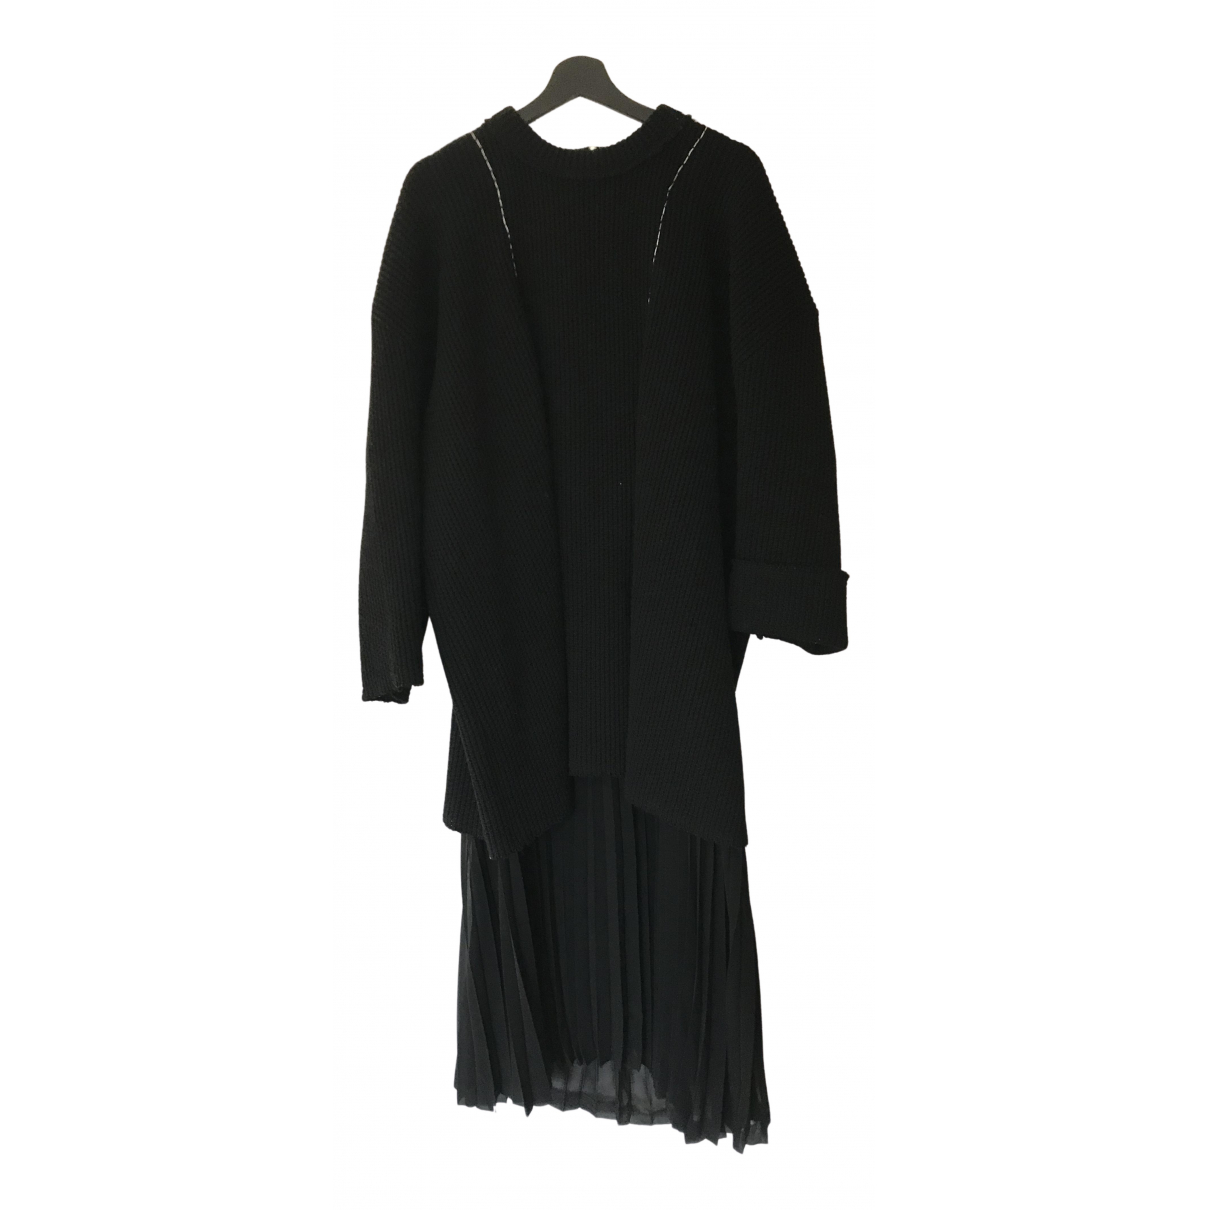 Comme Des Garcons N Black Wool dress for Women M International